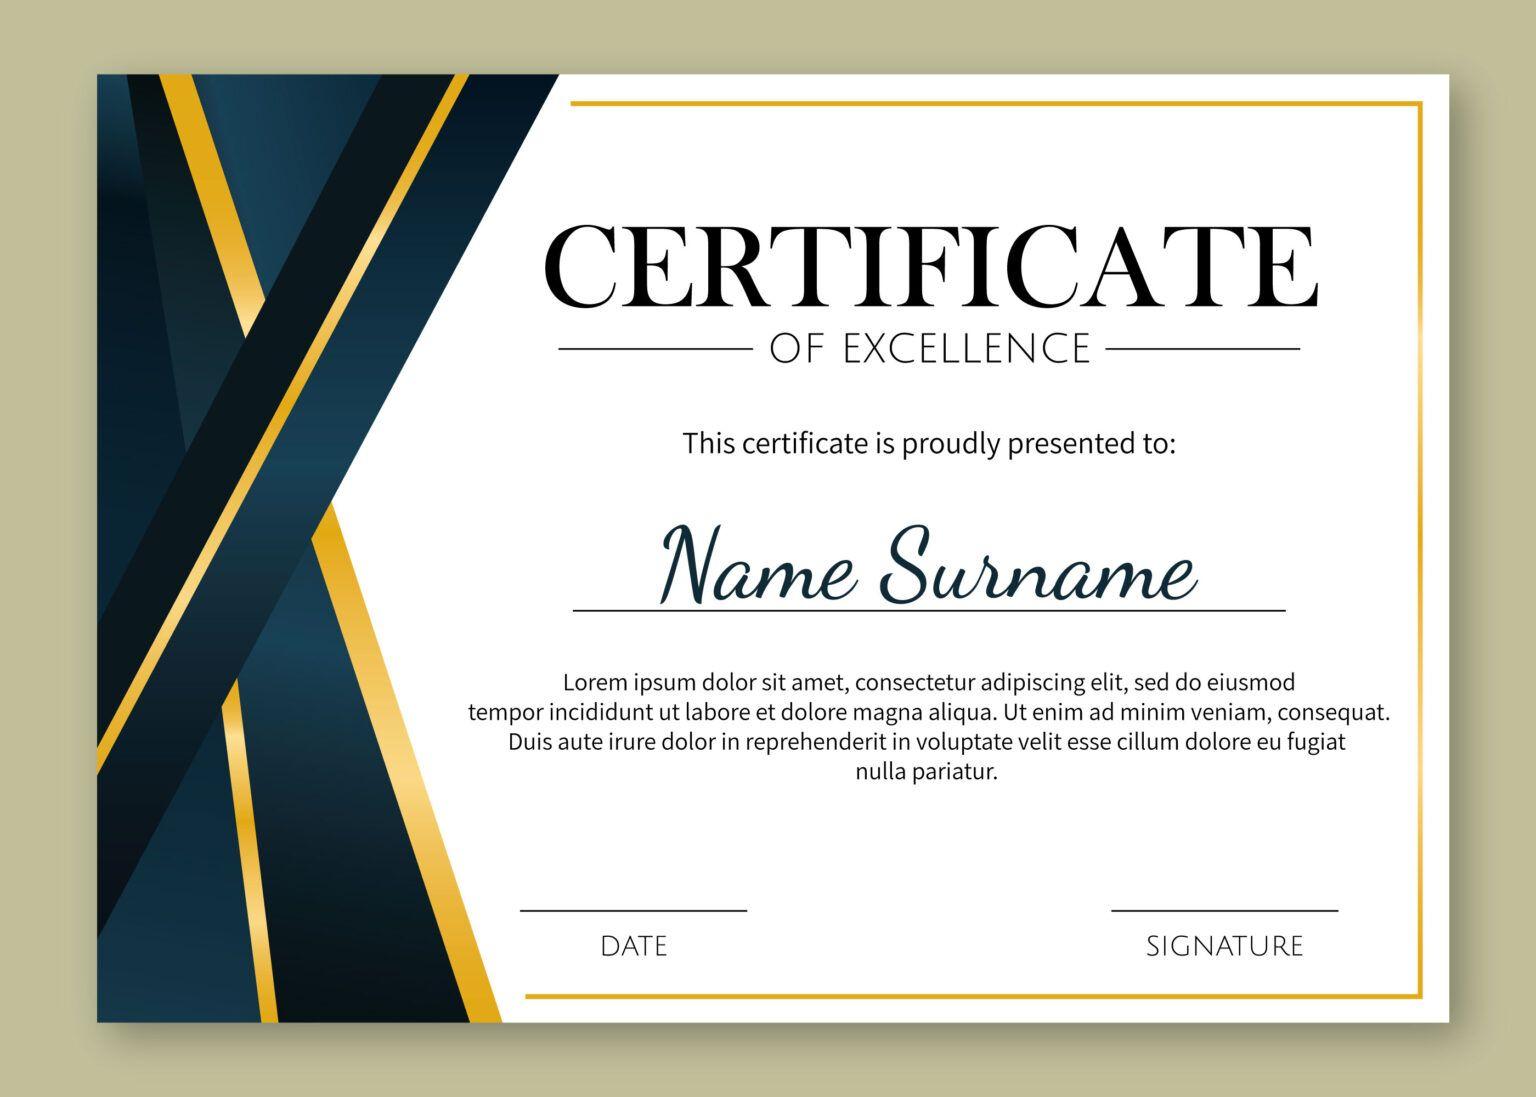 template certificate certificado excellence templates sample vetor printable piagam professional certificates certificaat modelo urkunde gratis vecteezy participation kostenlos achievement word